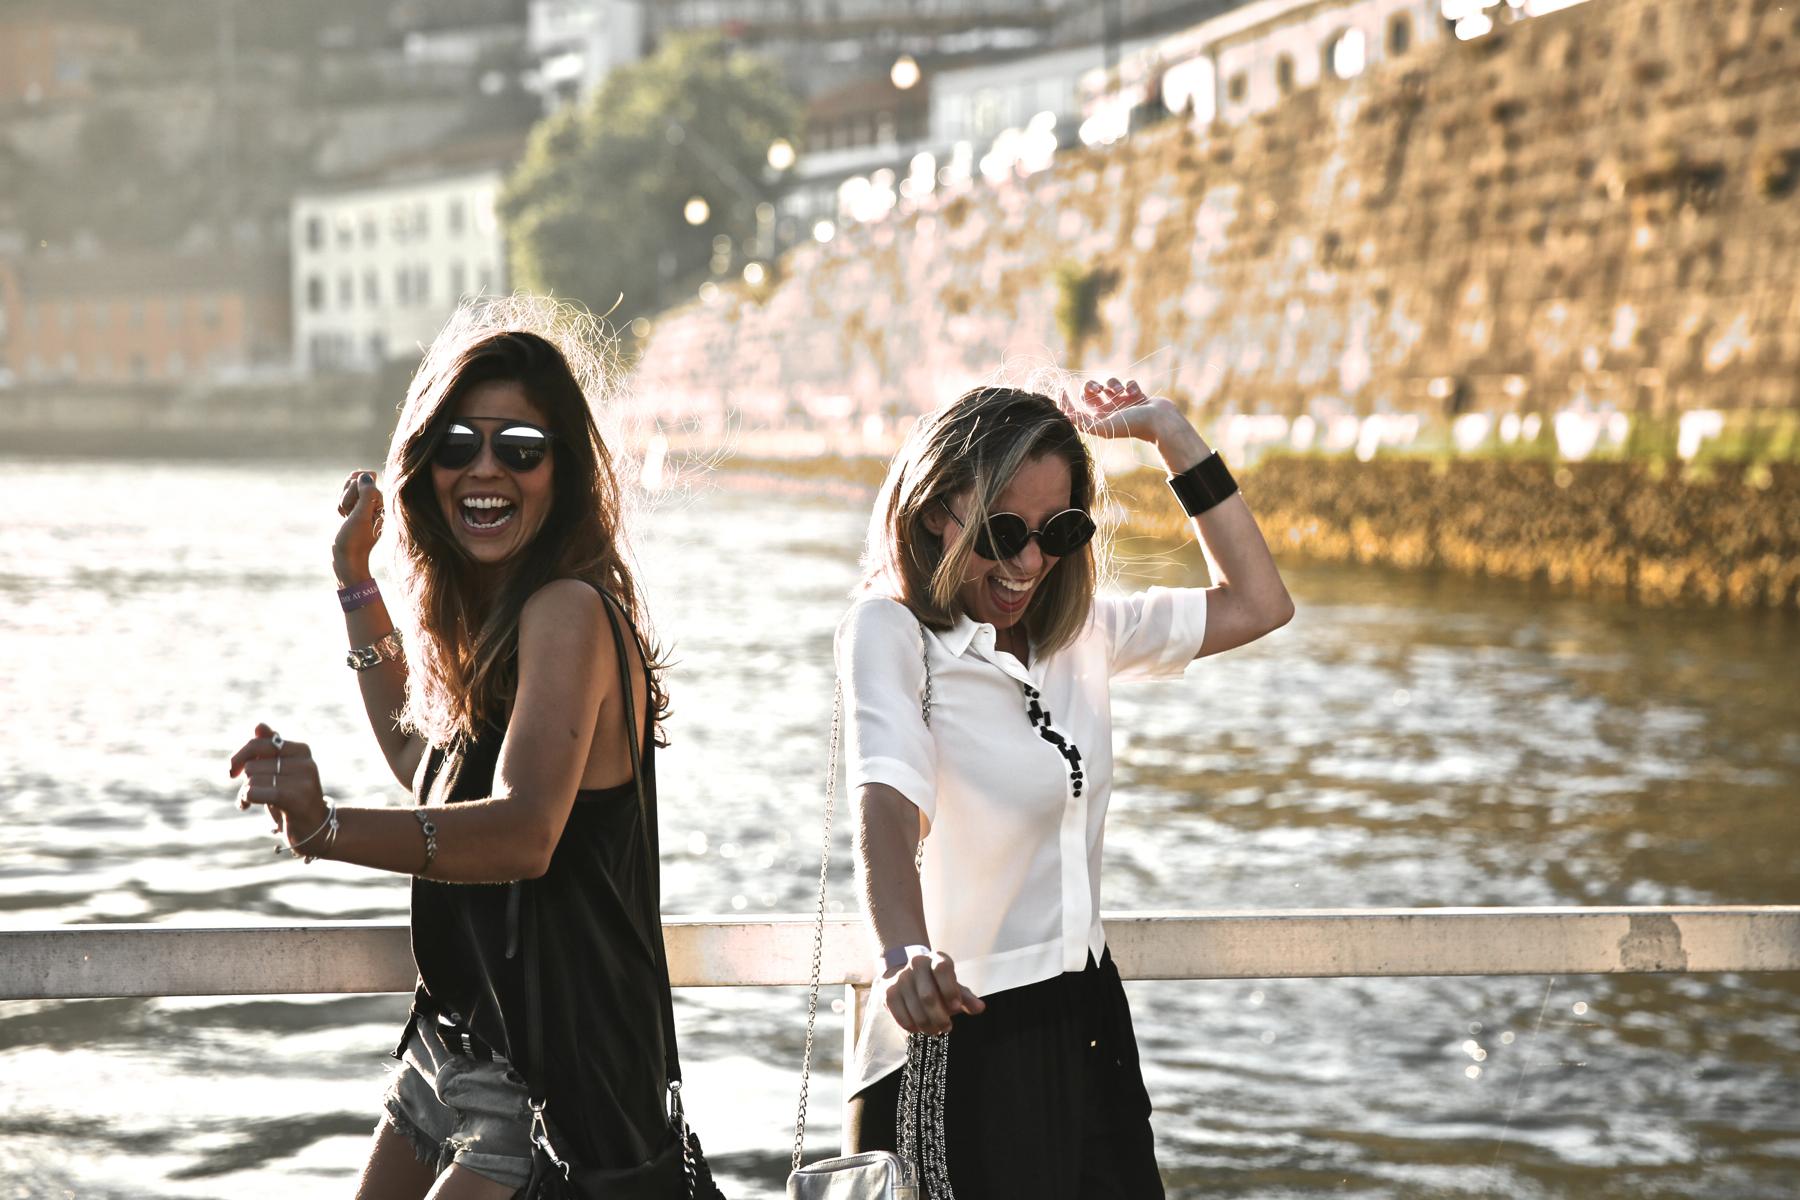 trendy_taste-look-outfit-street_style-ootd-blog-blogger-fashion_spain-moda_españa-salsa_jeans-dior_gafas-bolso_flecos-fringes_bag-khaki_shorts-shorts_caqui-grey_tee-camiseta_gris-verano-porto-portugal-17